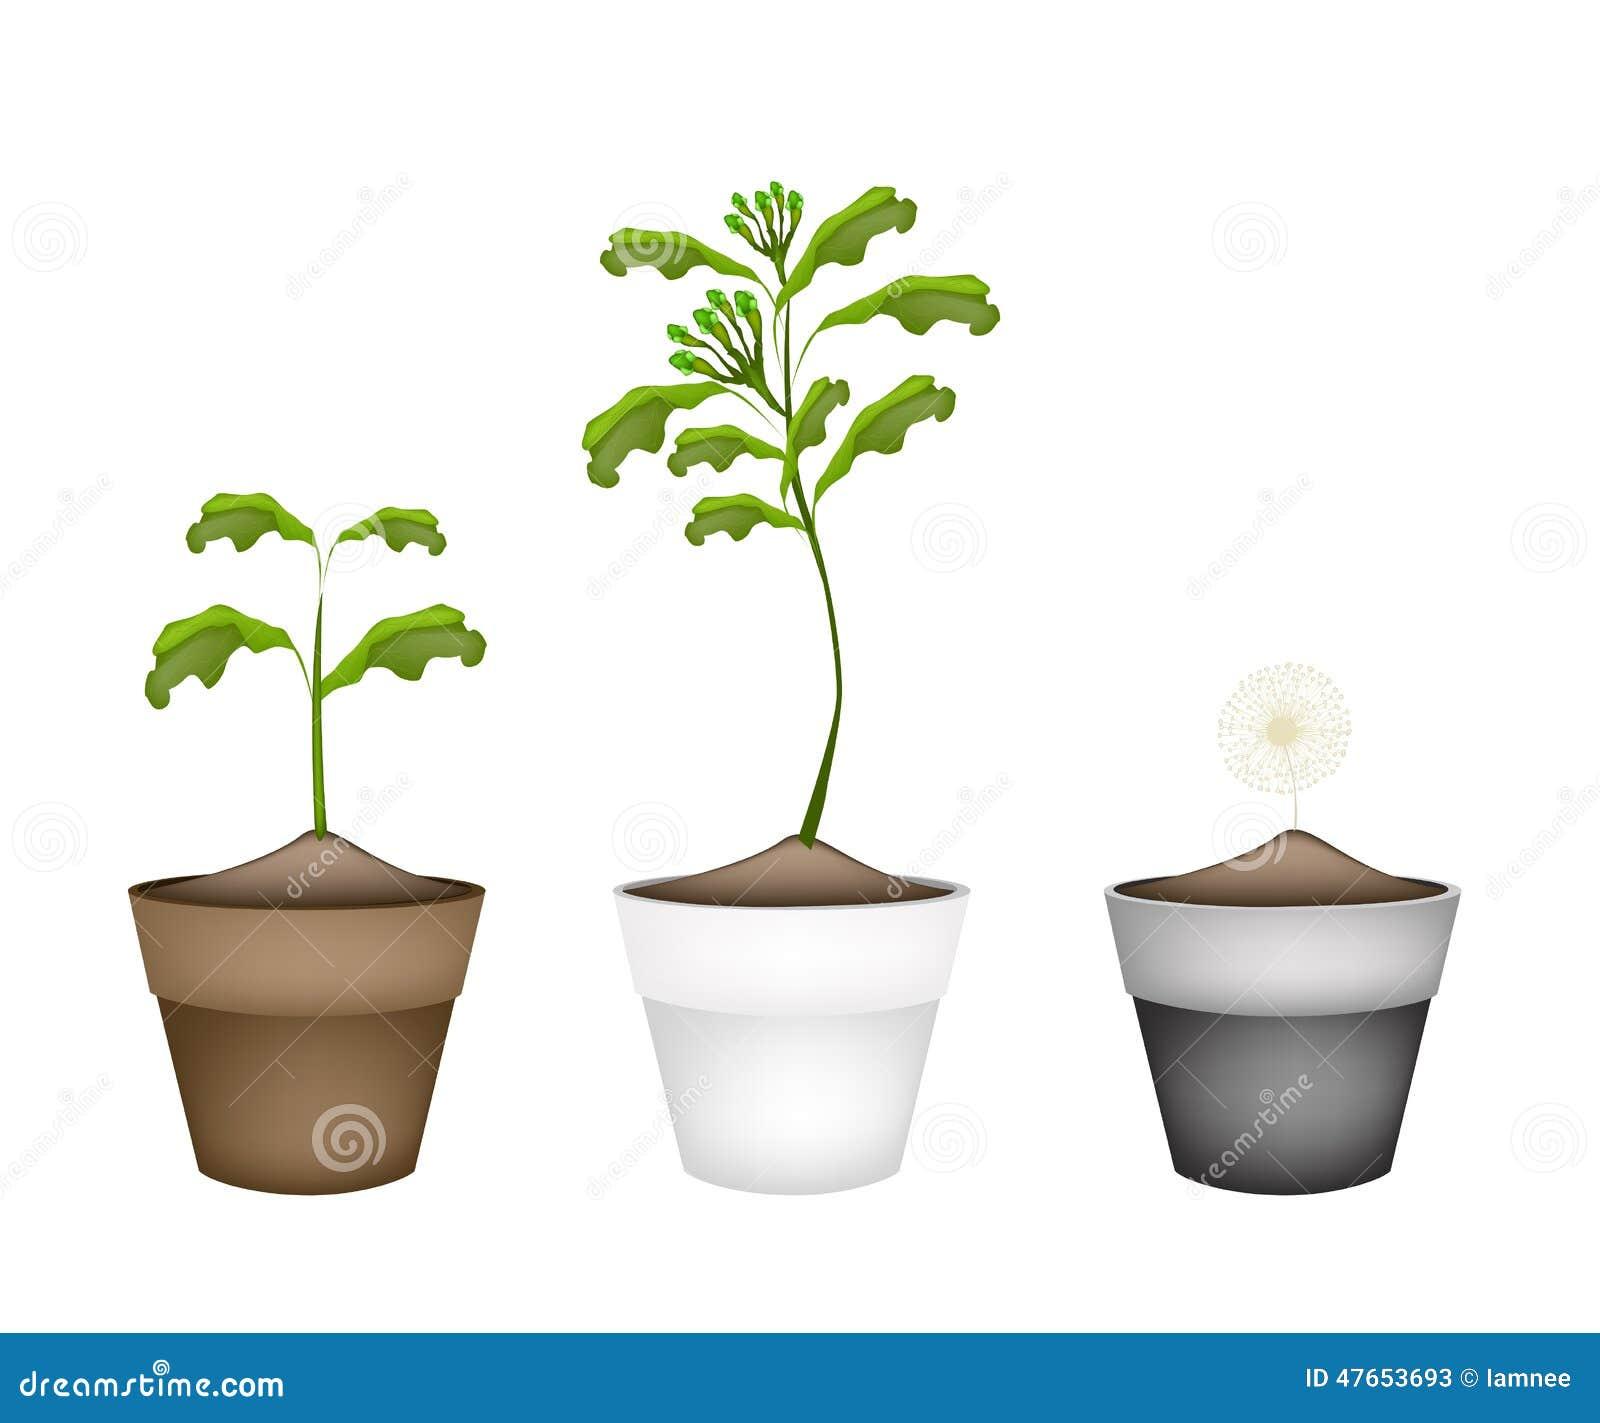 Fresh Clove Plant In Ceramic Flower Pots Stock Vector - Illustration